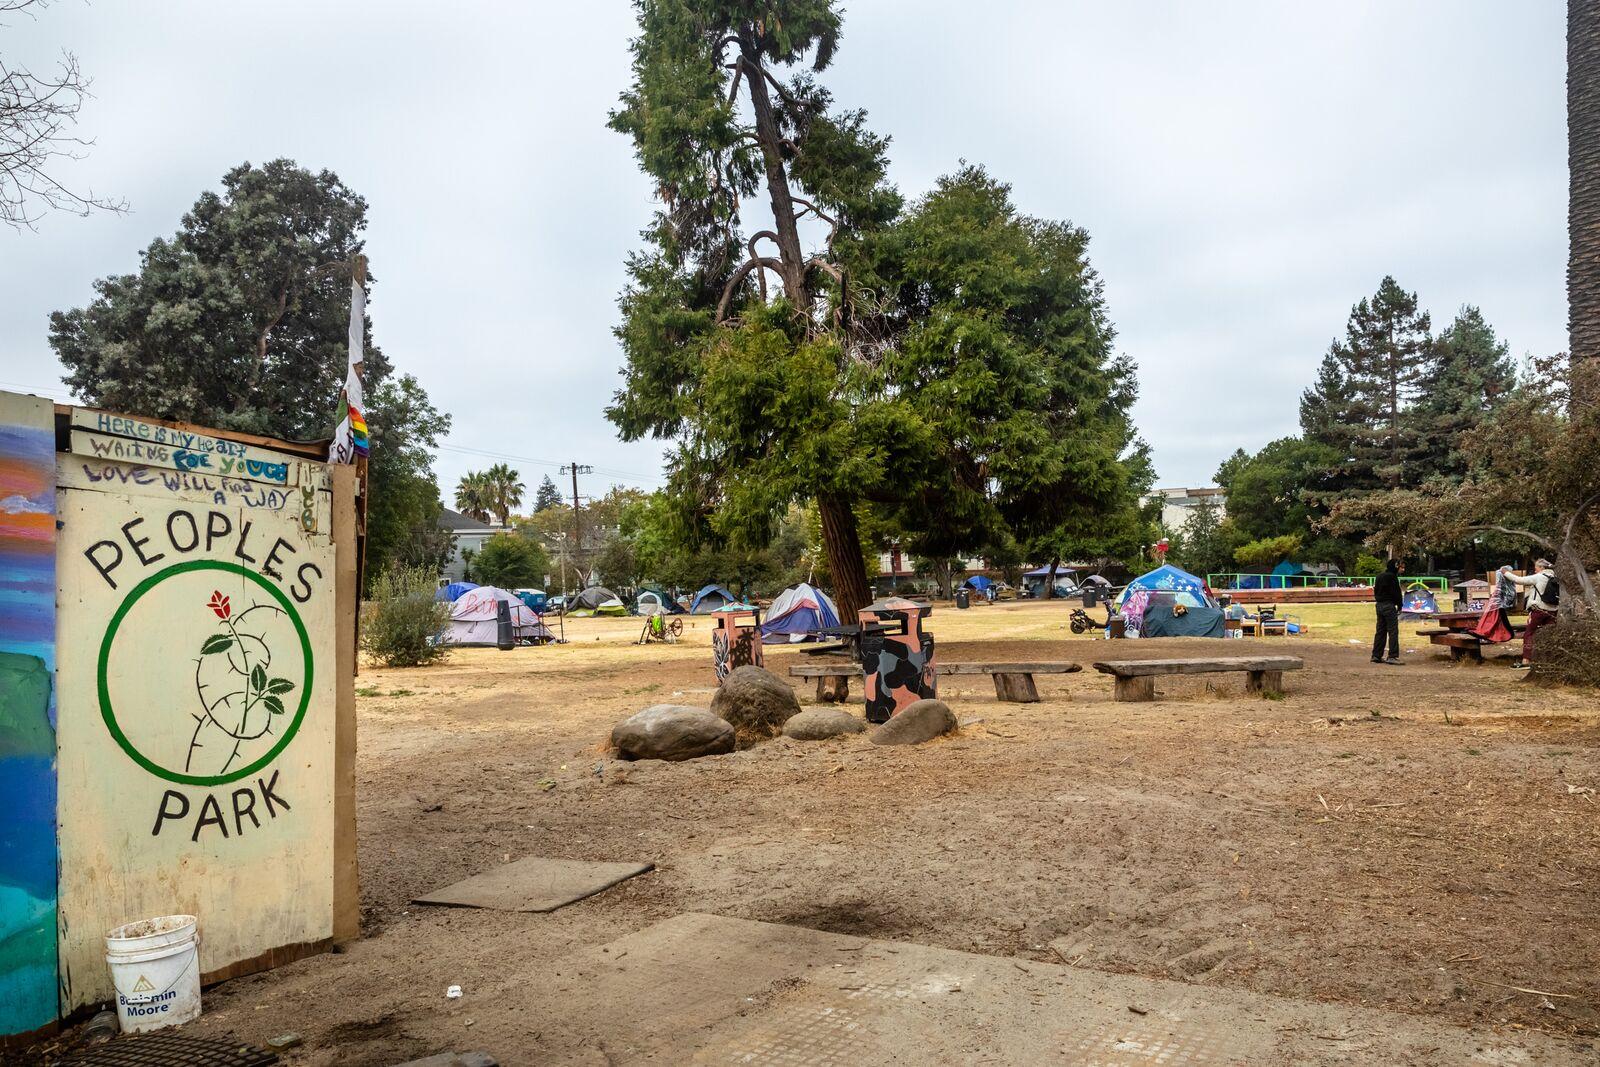 People's Park as seen on August 26, 2021. Credit: Kelly Sullivan